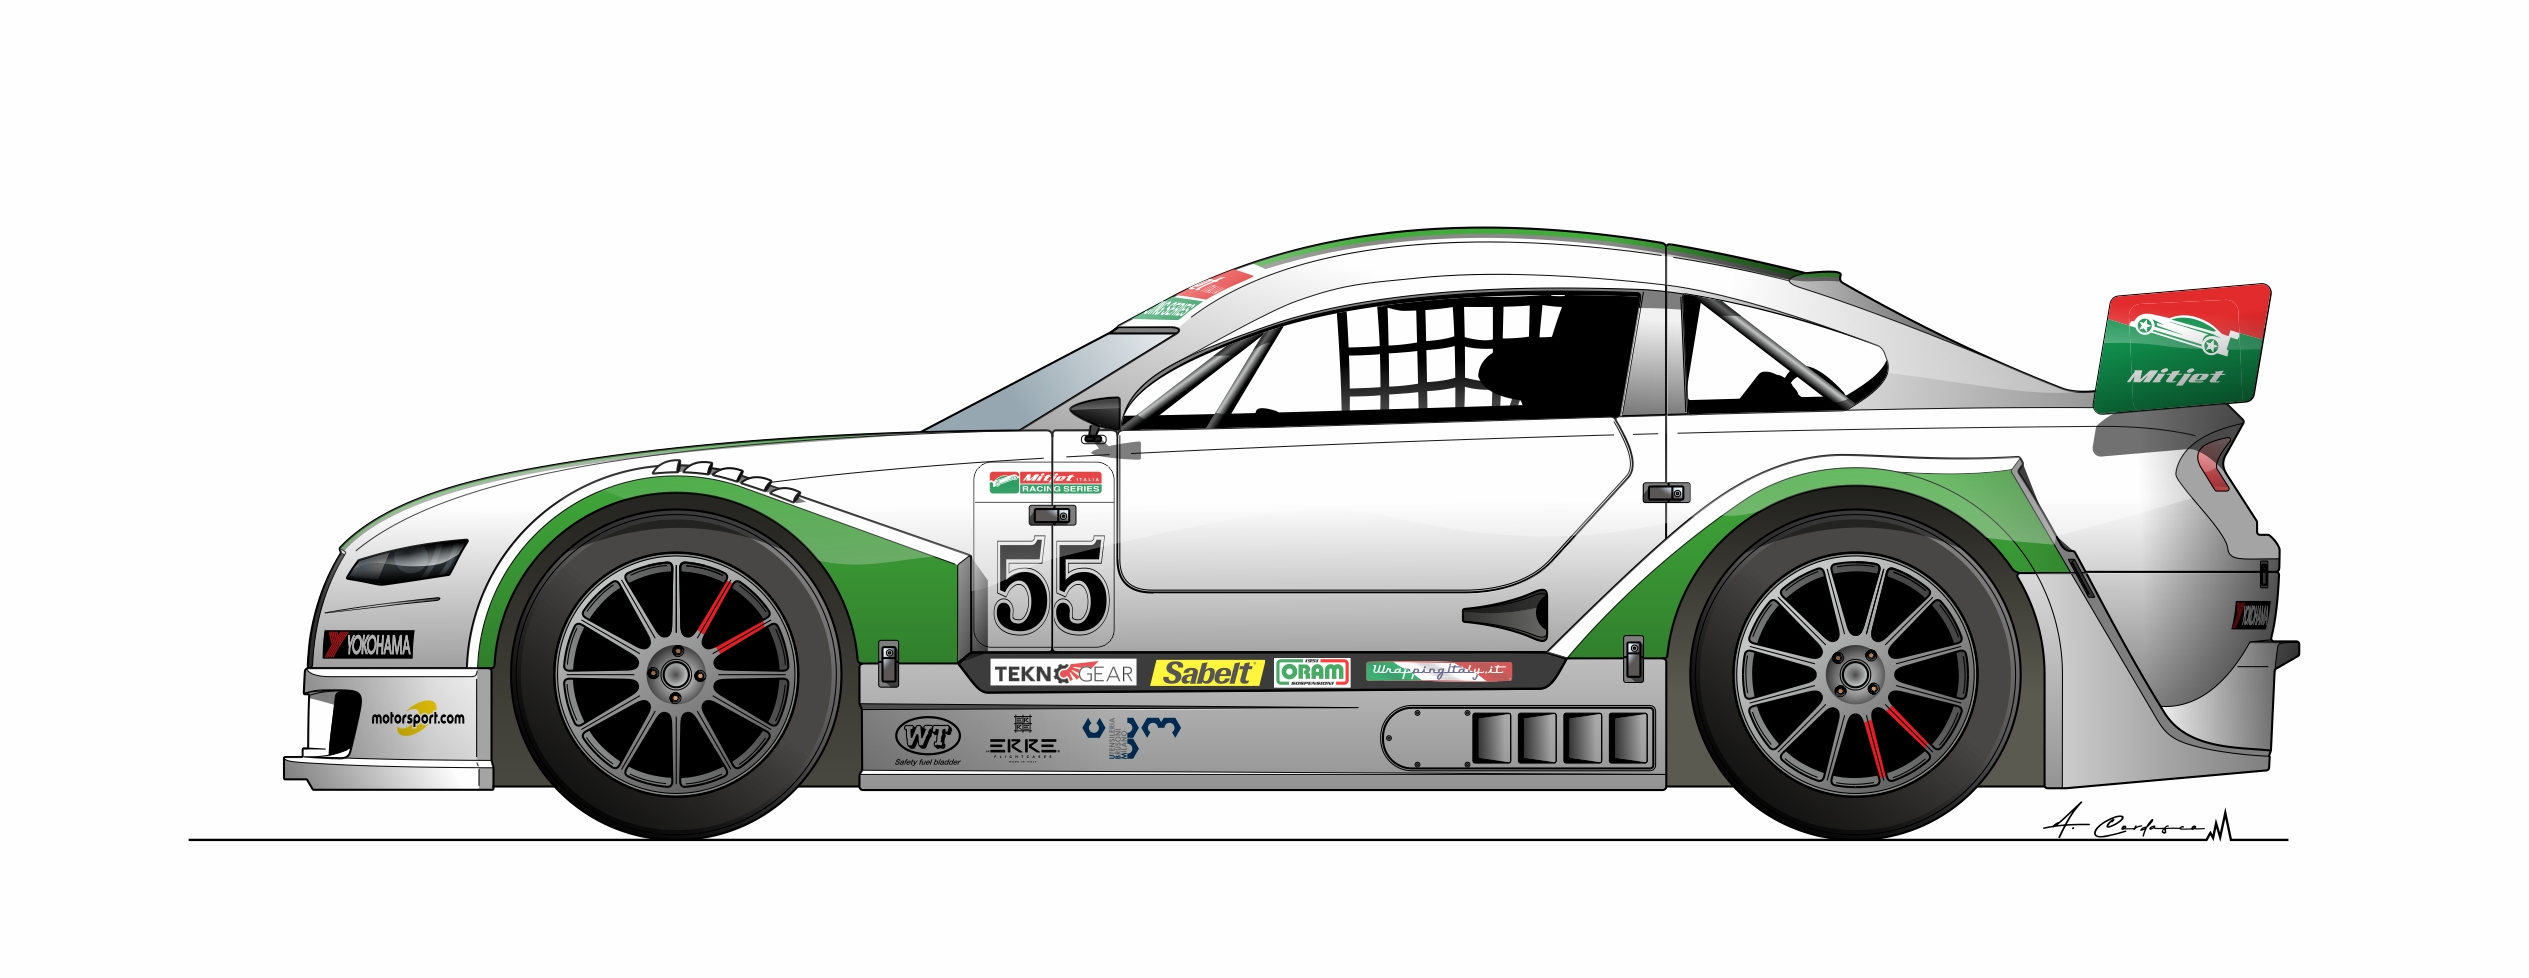 Francesco Malvestiti - Team The Club Motorsport